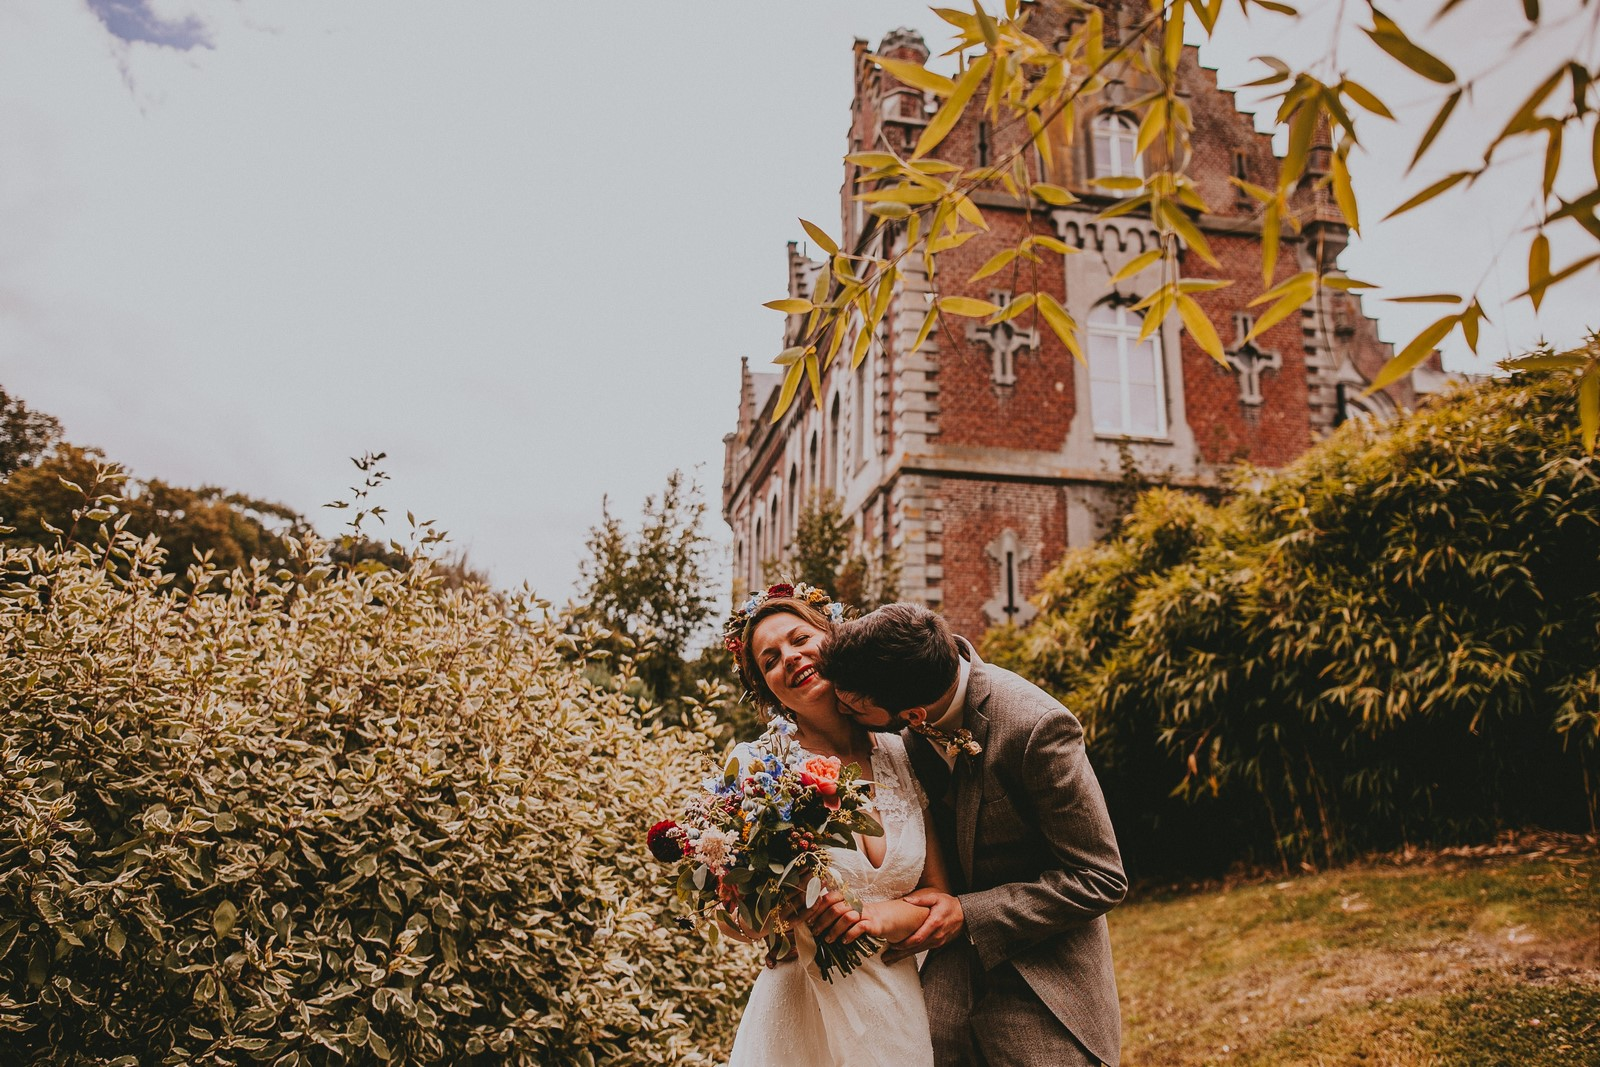 photographe mariage chateau de bourgogne 31